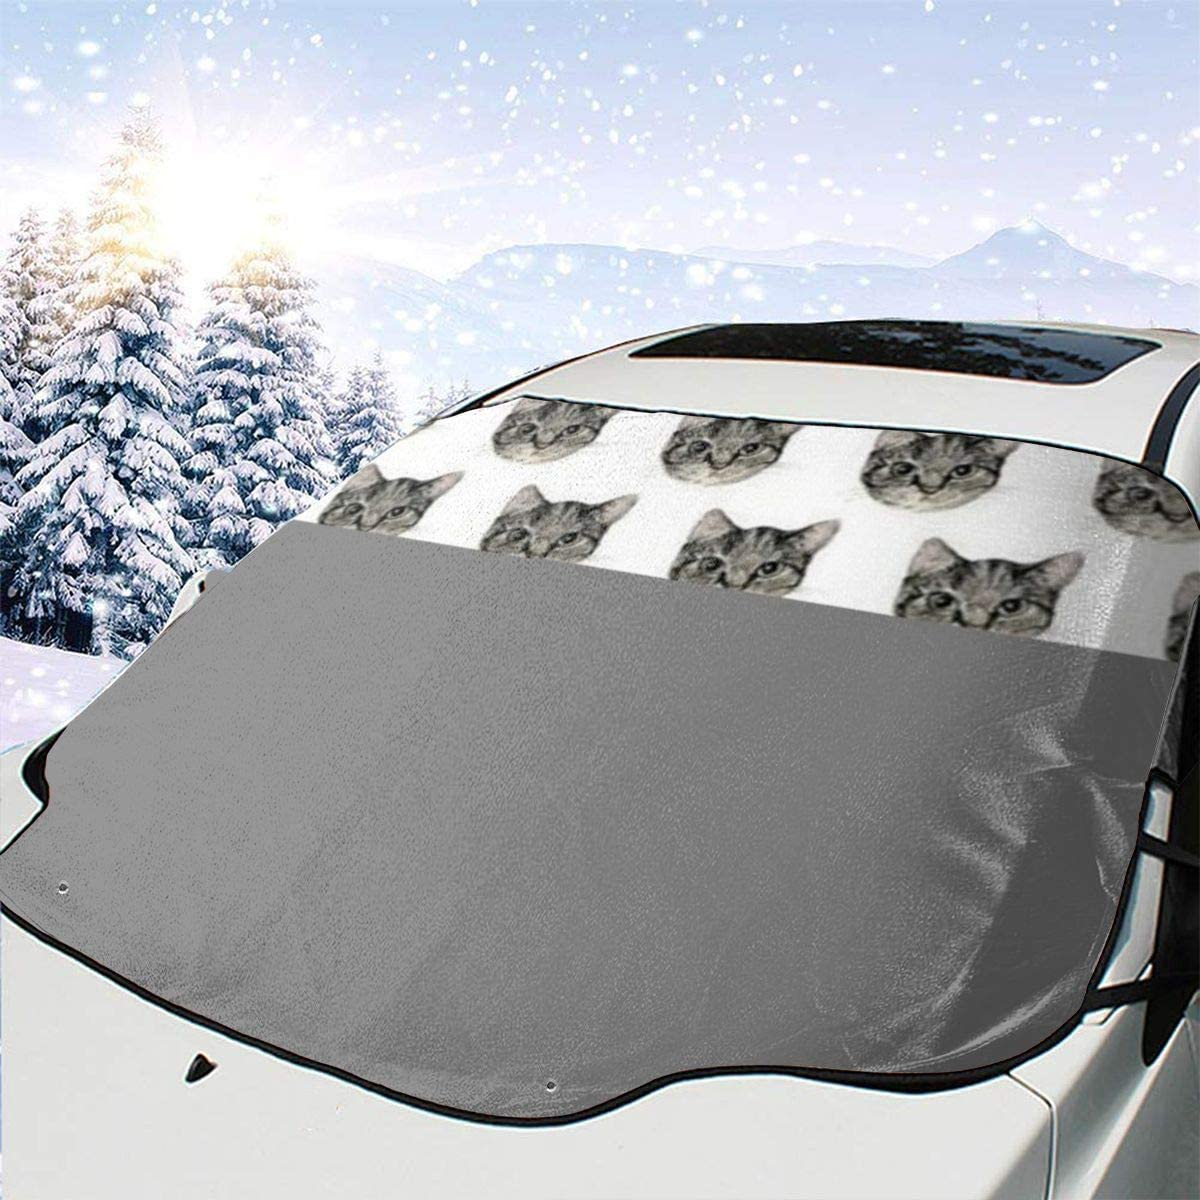 Mattrey French Bulldog Car Windshield Sun Shade Cover Front Water Sunlight Snow Cover